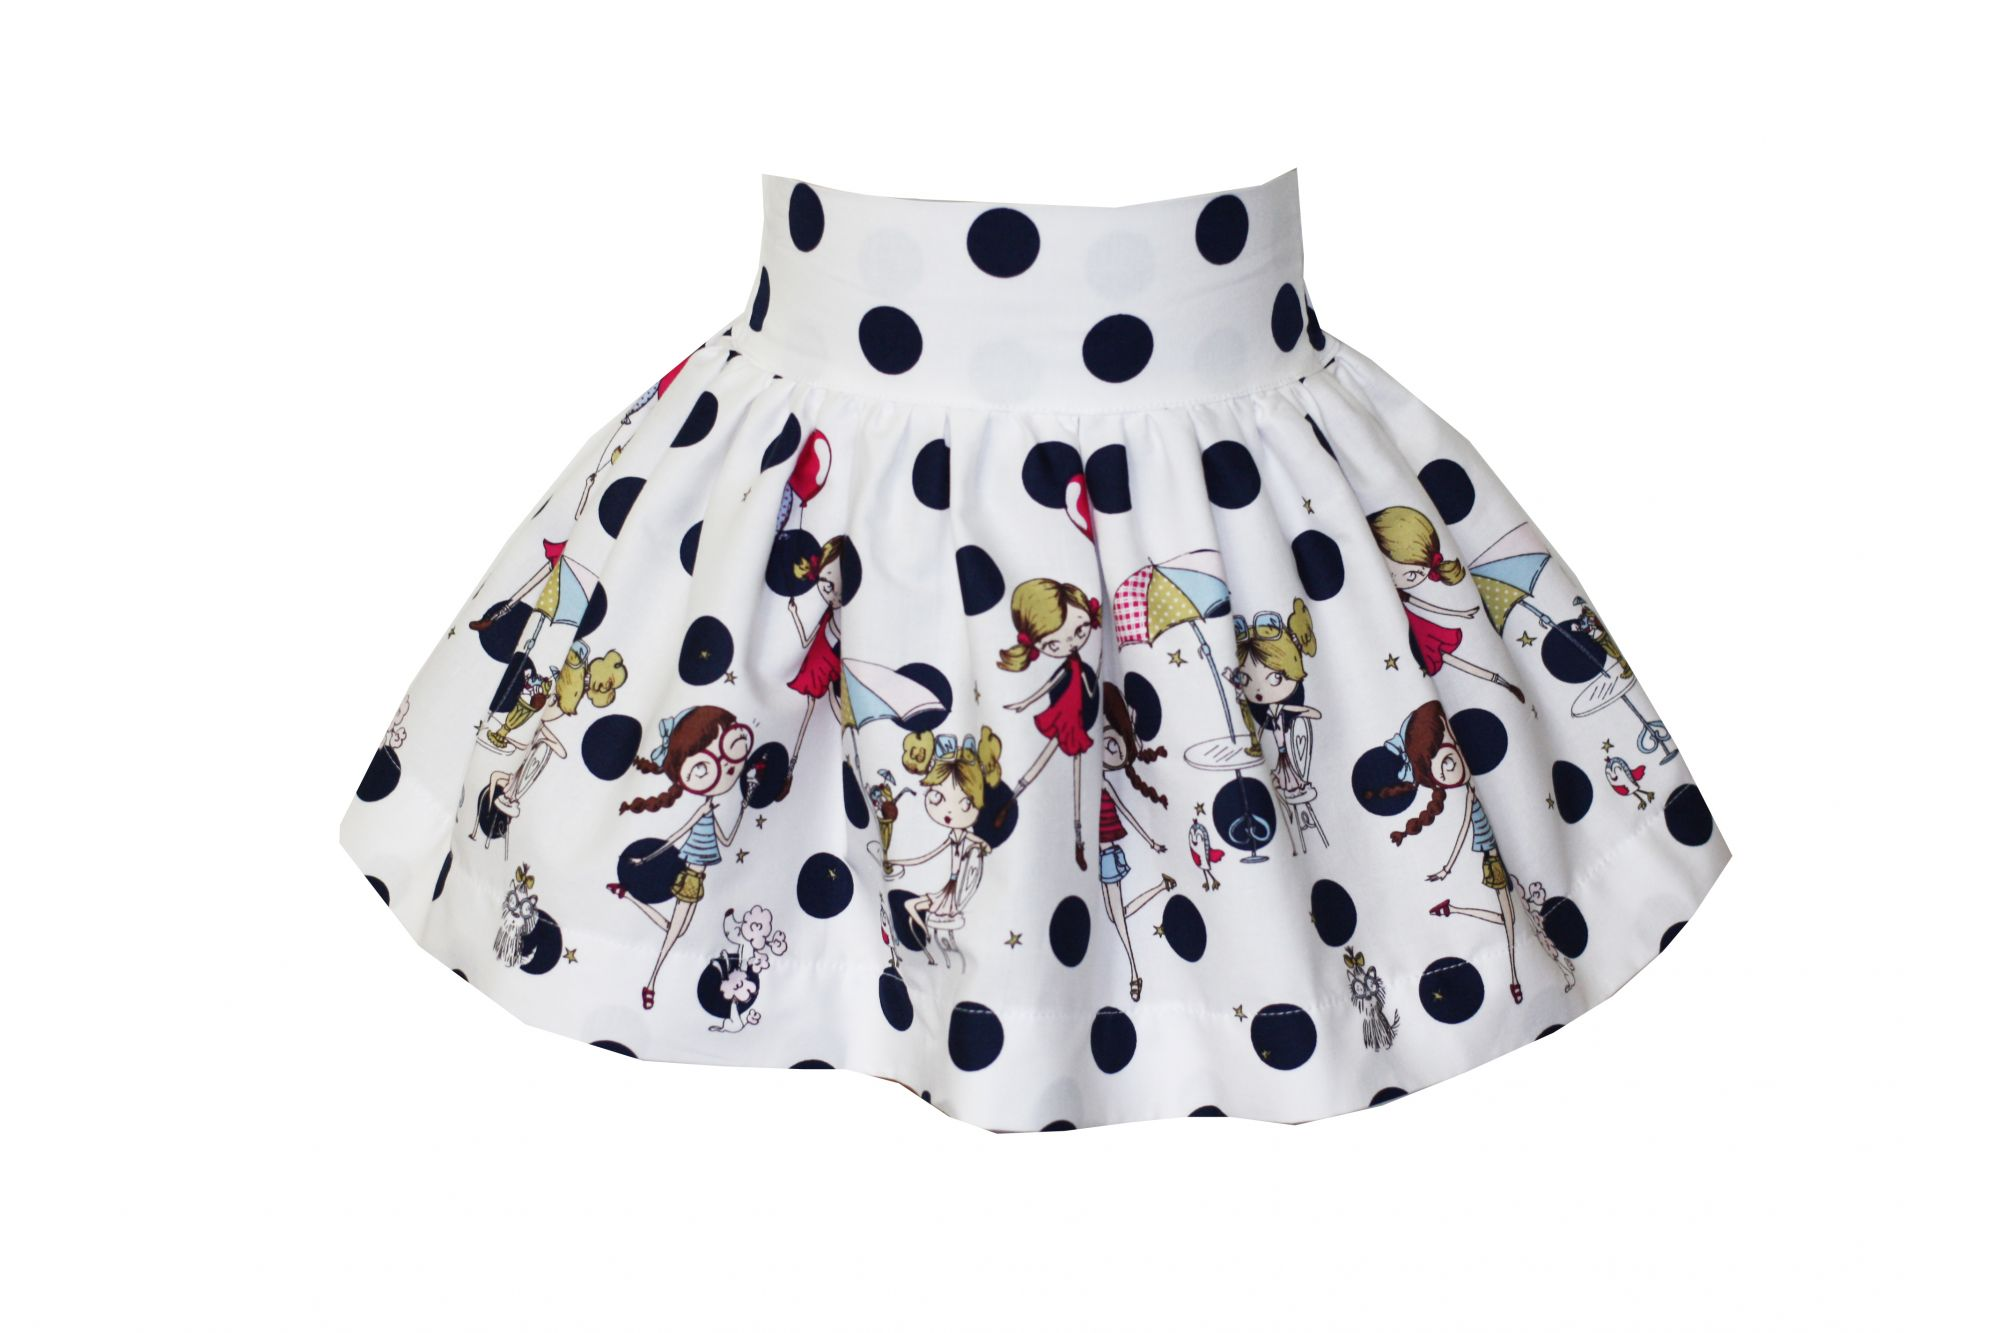 48987 Костюм Топ+юбка в темно-синий горох (поплин)